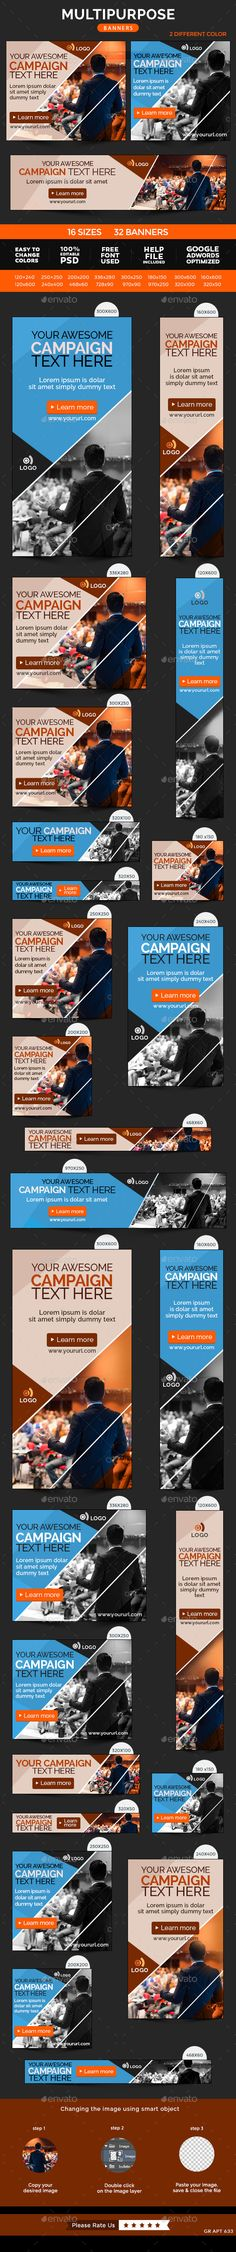 Multipurpose Banners Design Template #banners #web #design Download: http://graphicriver.net/item/multipurpose-banners/11479280?ref=ksioks